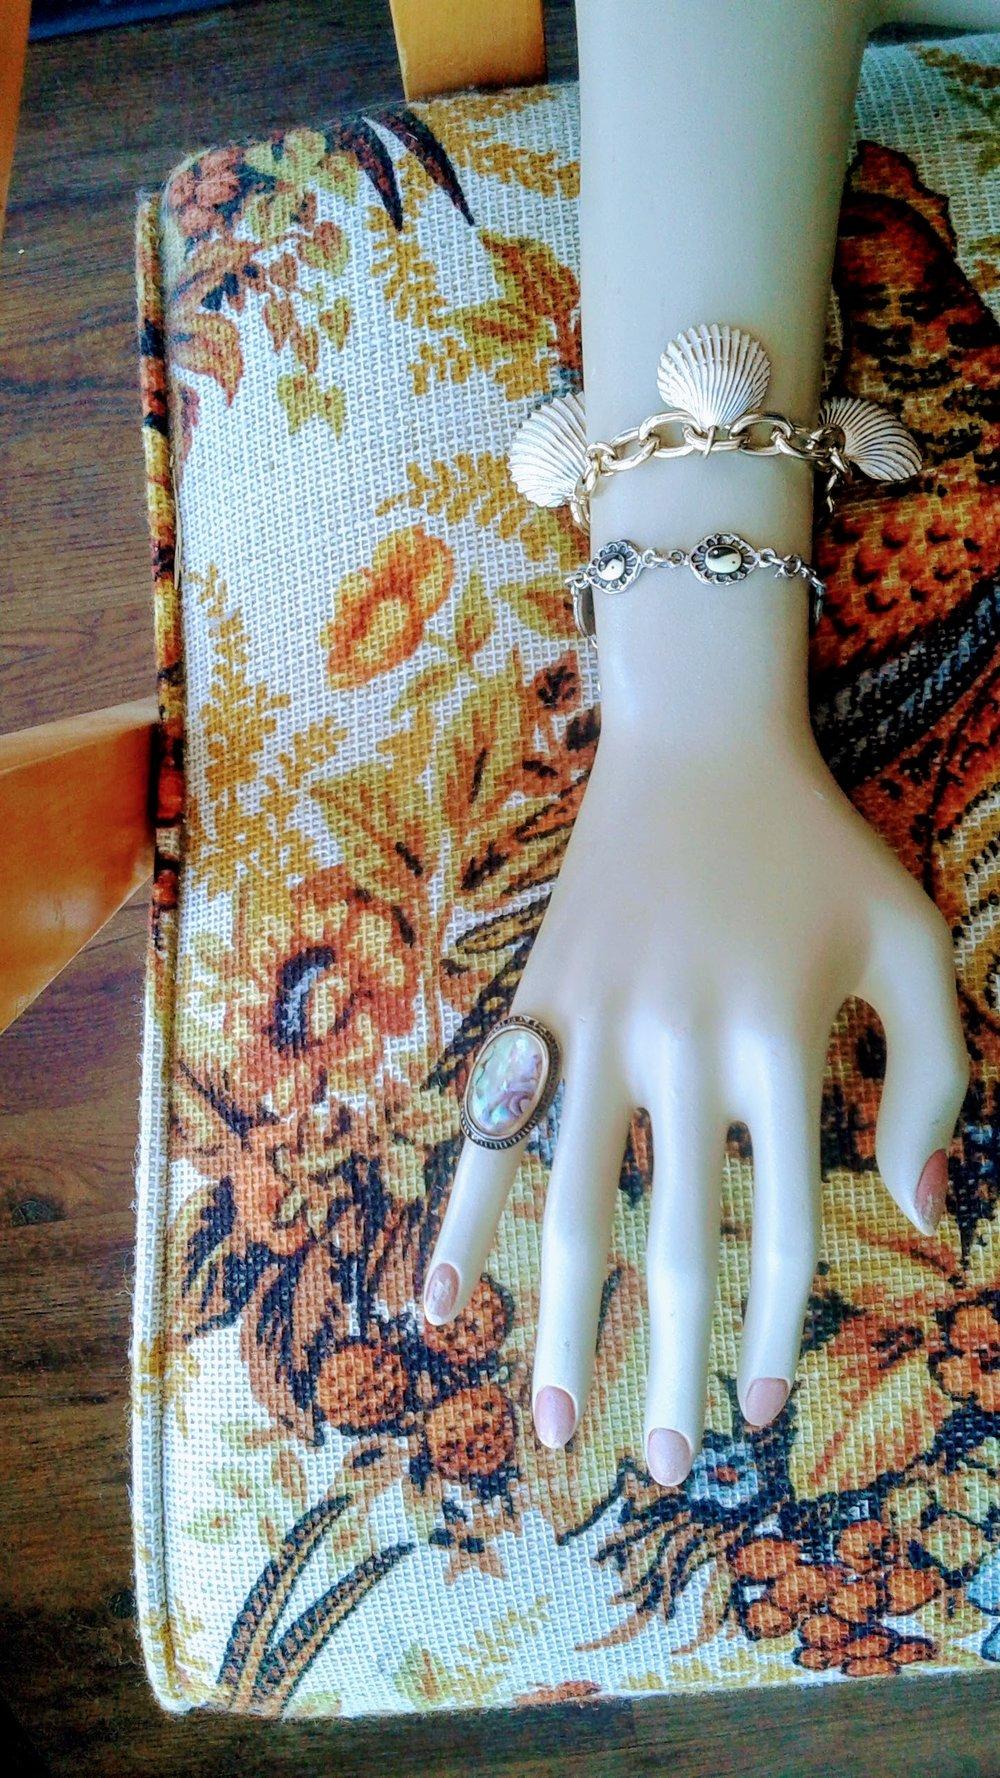 Shell bracelette, $14; Yin-yang bracelette, $12; Ring, $20